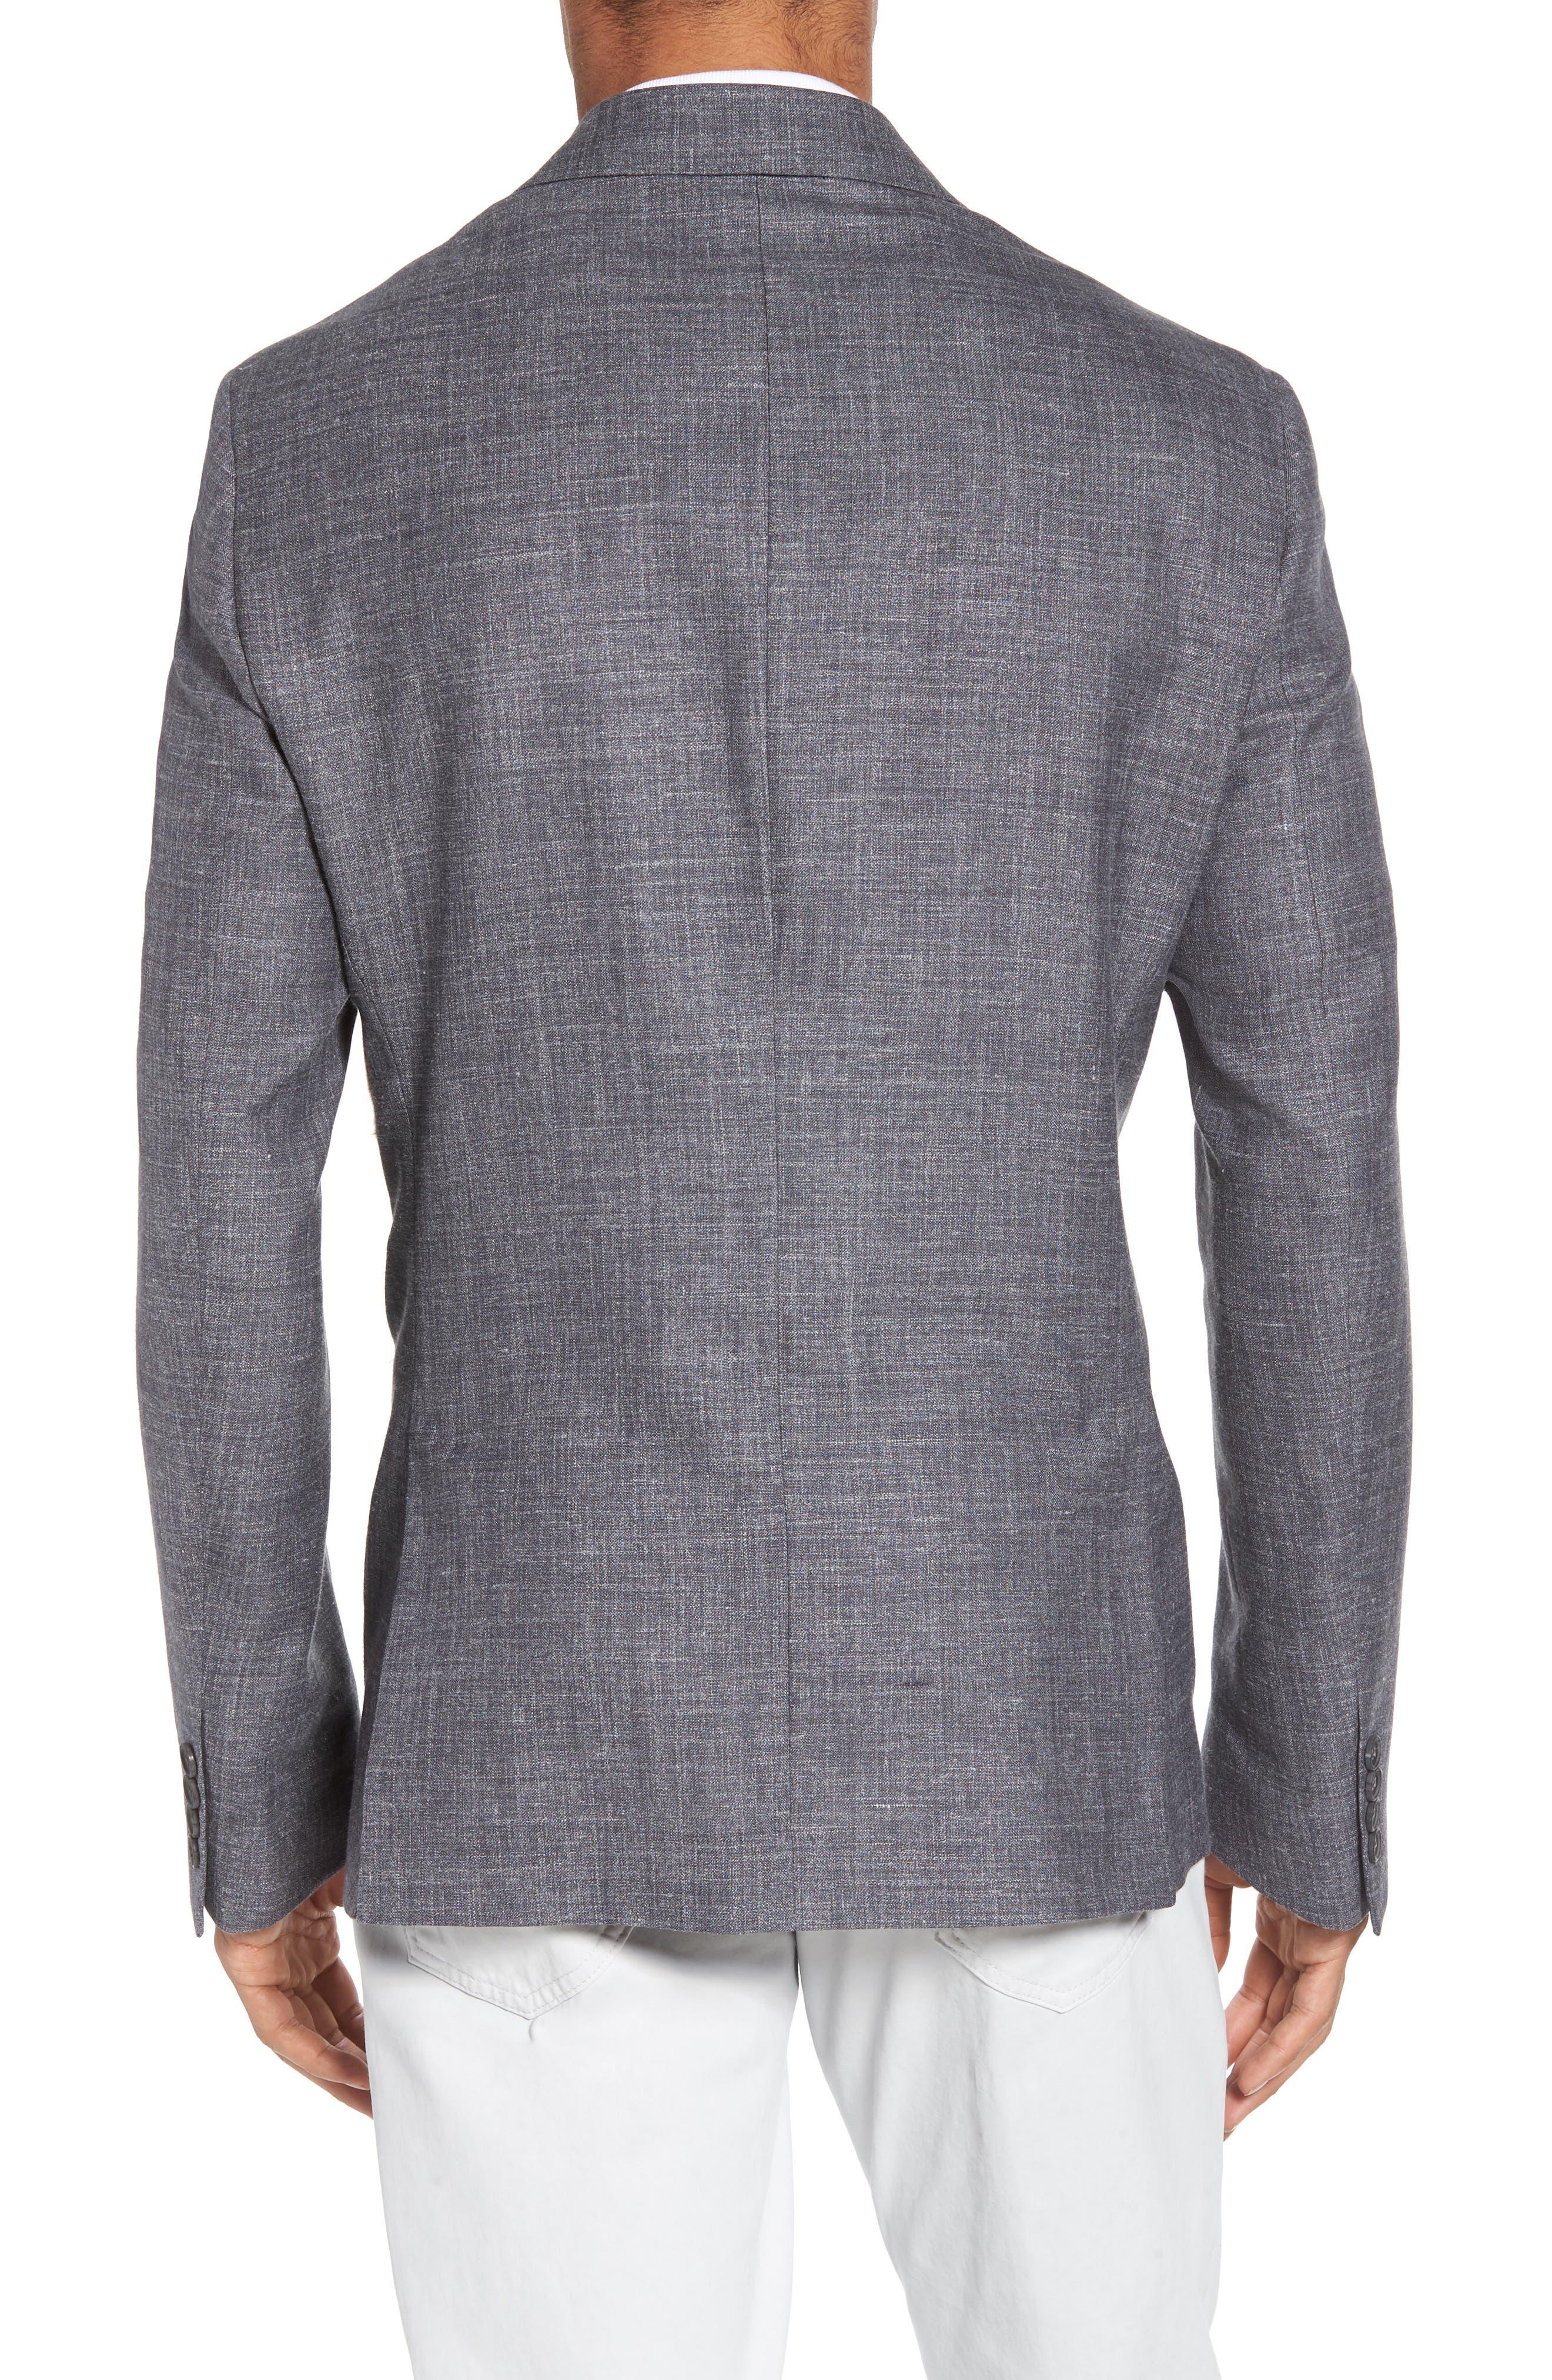 Trim Fit Wool Blend Blazer,                             Alternate thumbnail 2, color,                             020